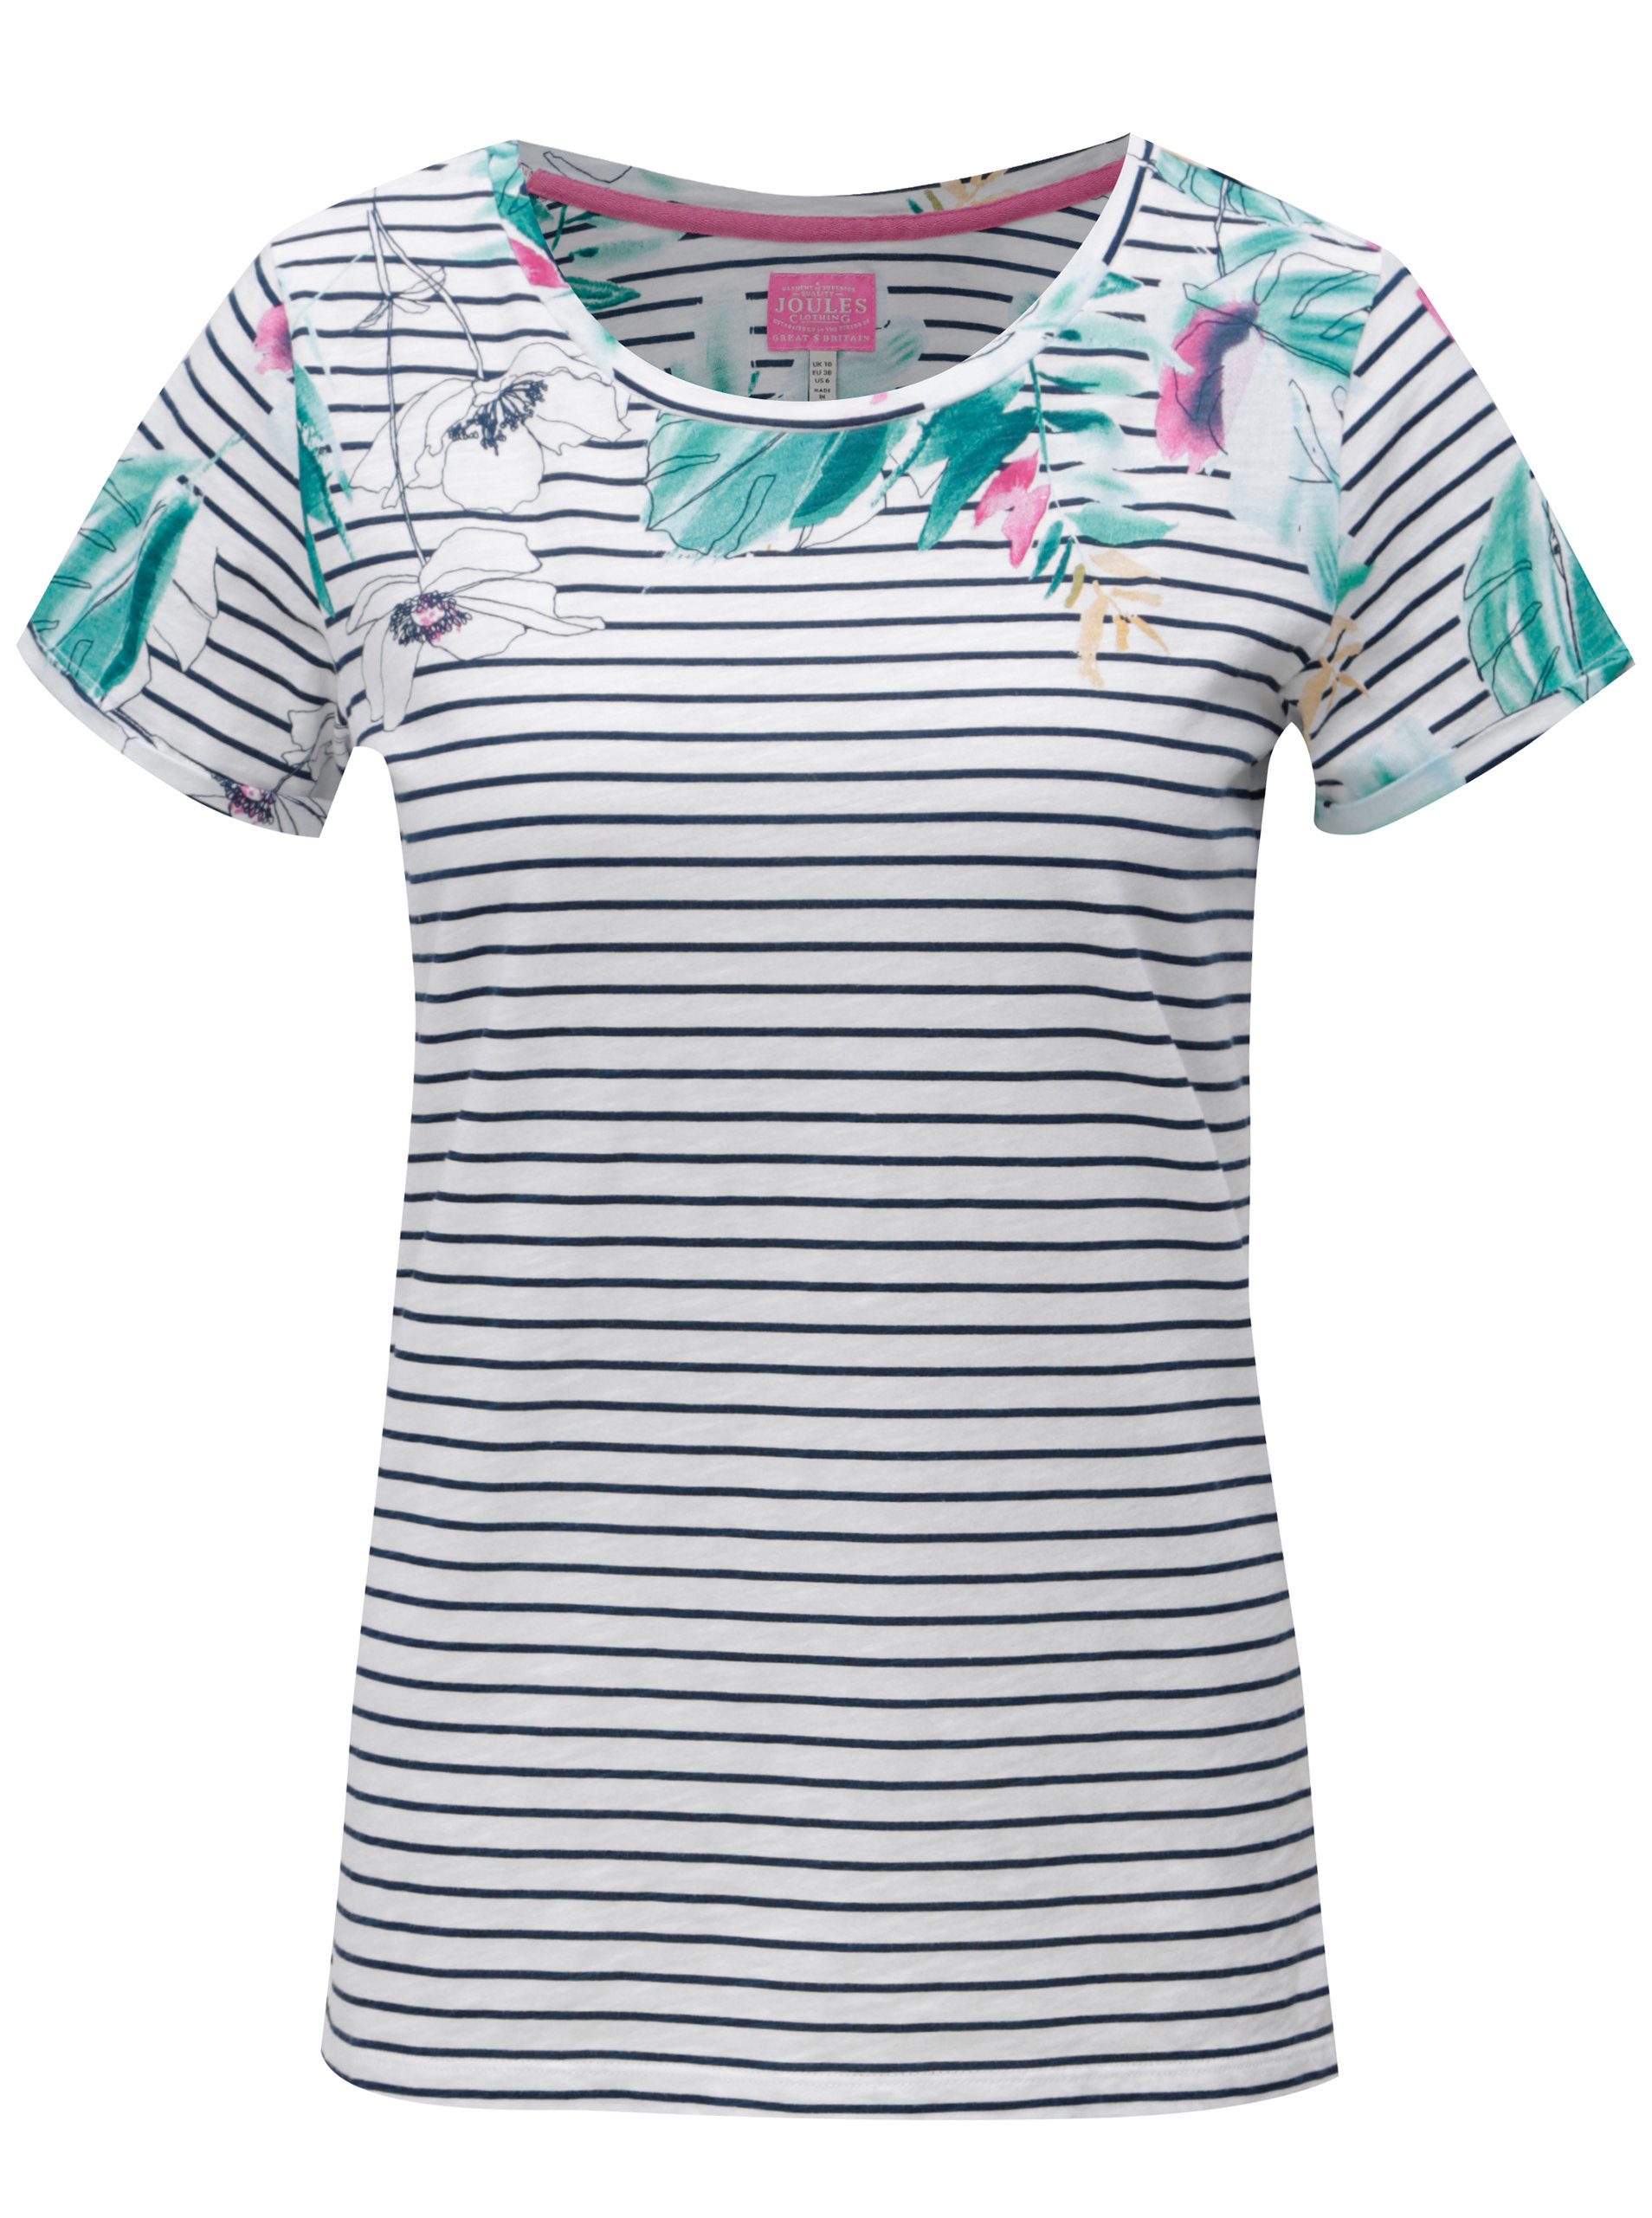 7dbba5f76b Modro-biele pruhované tričko s potlačou Tom Joule Jersey ...